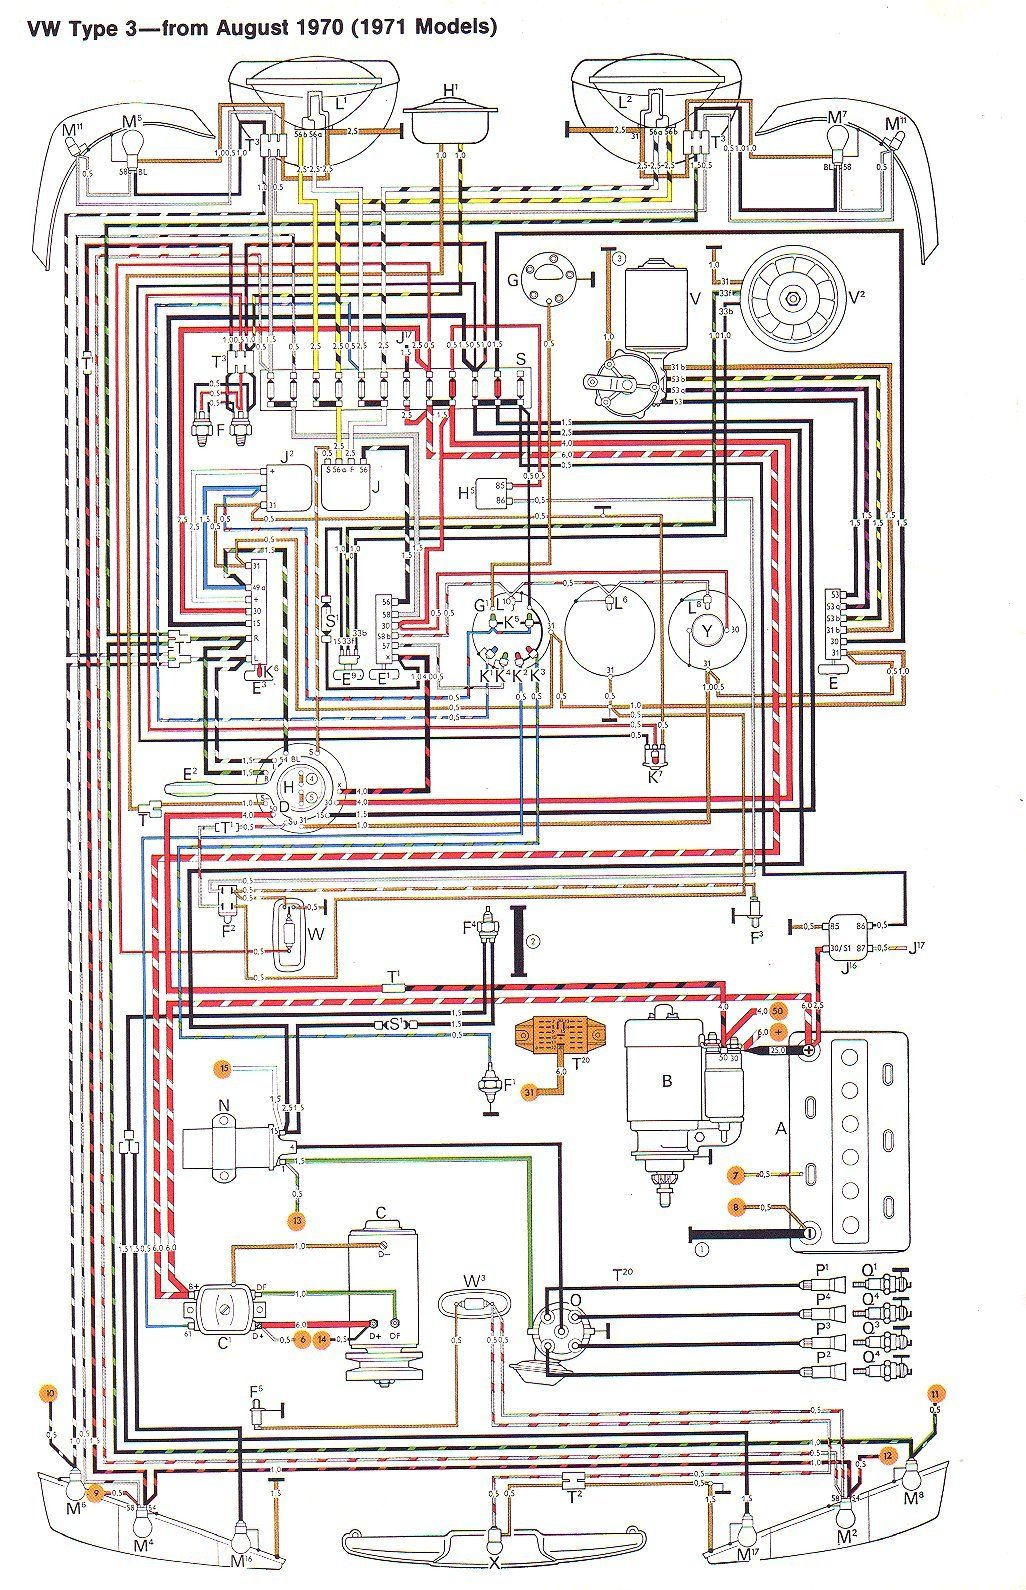 71 VW T3 wiring diagram | Ruthie | Electrical diagram